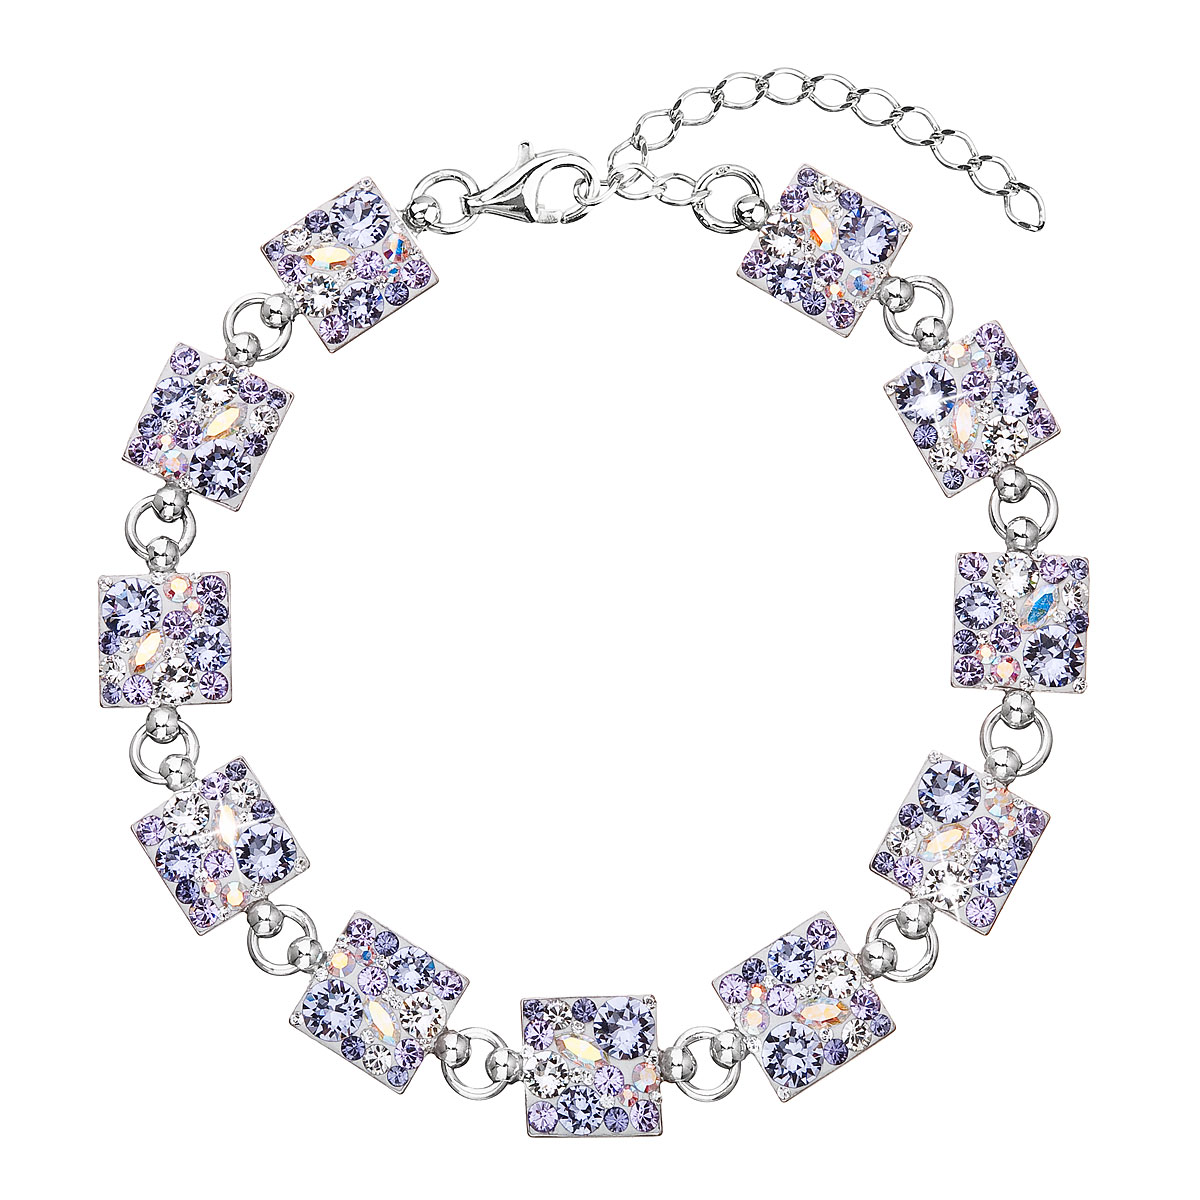 Stříbrný náramek se Swarovski krystaly fialový 33047.3 violet